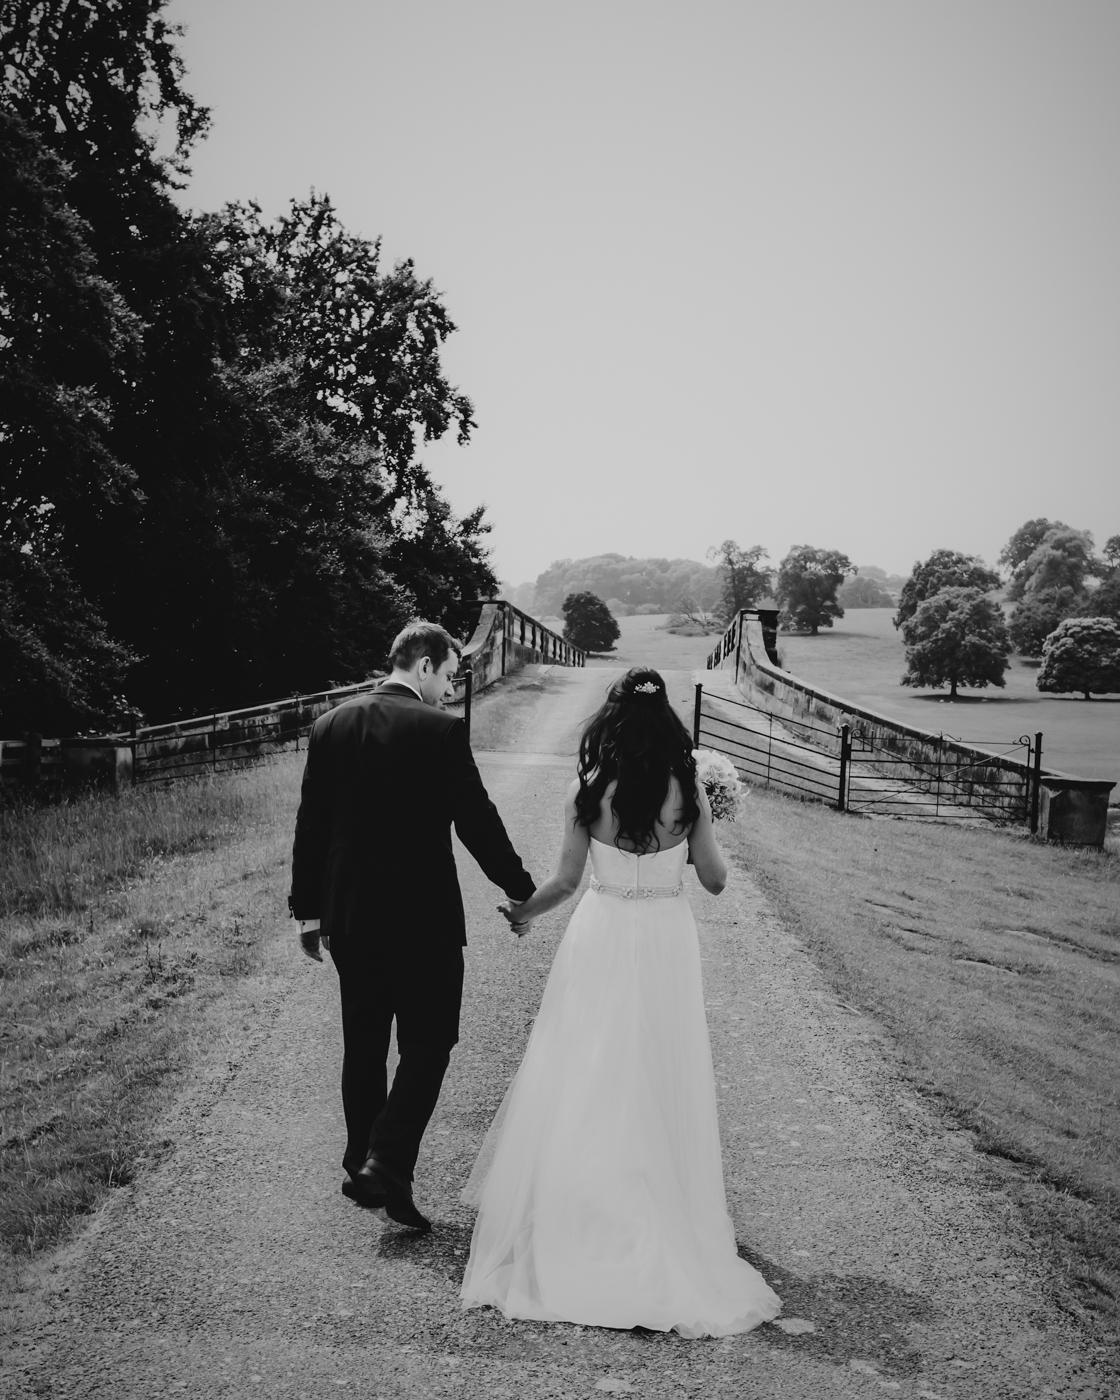 118 - Abi and Chris at Kedleston Hall - Wedding Photography by Mark Pugh www.markpugh.com - 0438.JPG